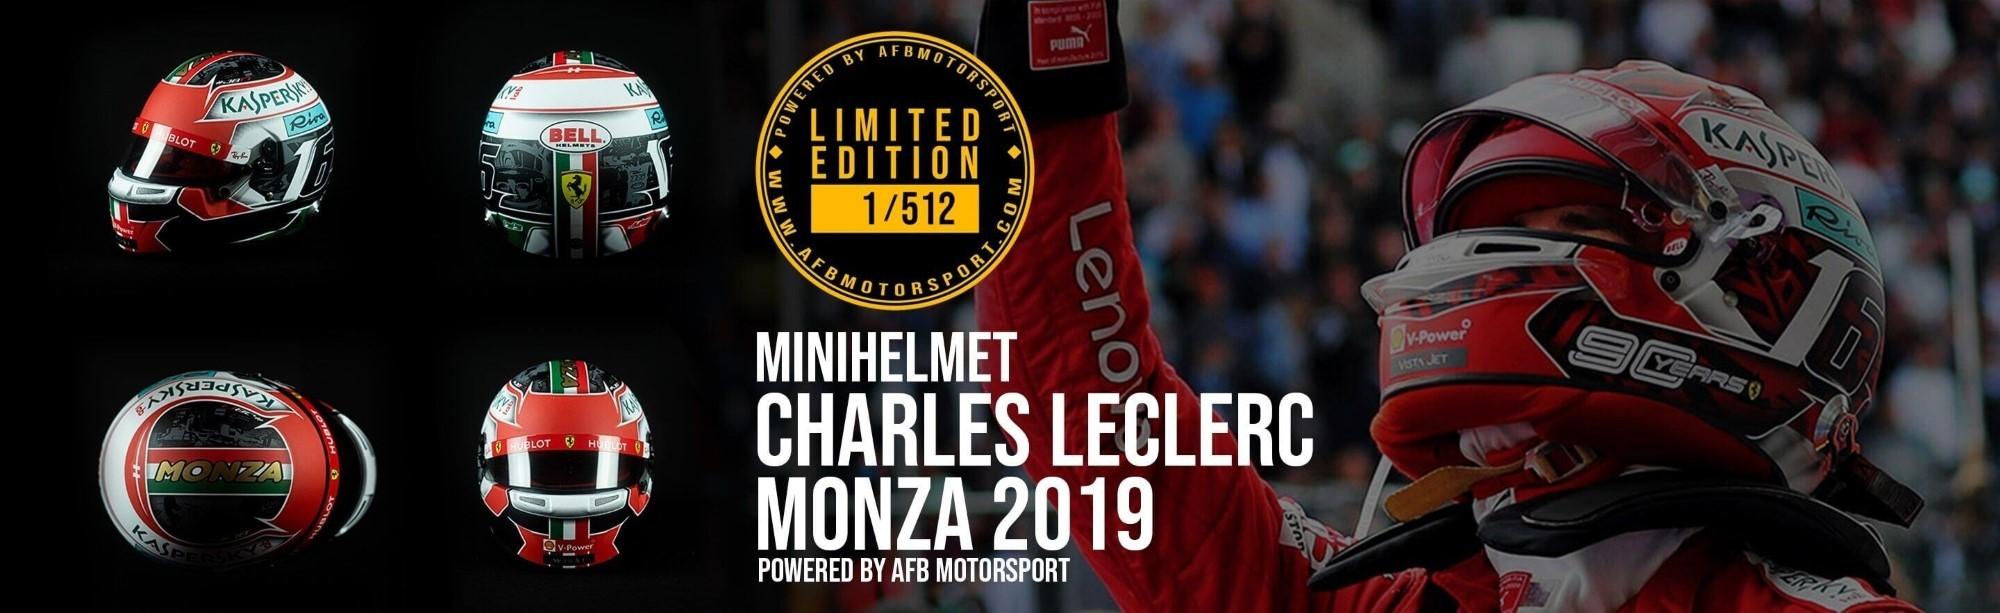 Mini Helmet Charles Leclerc Monza 2019